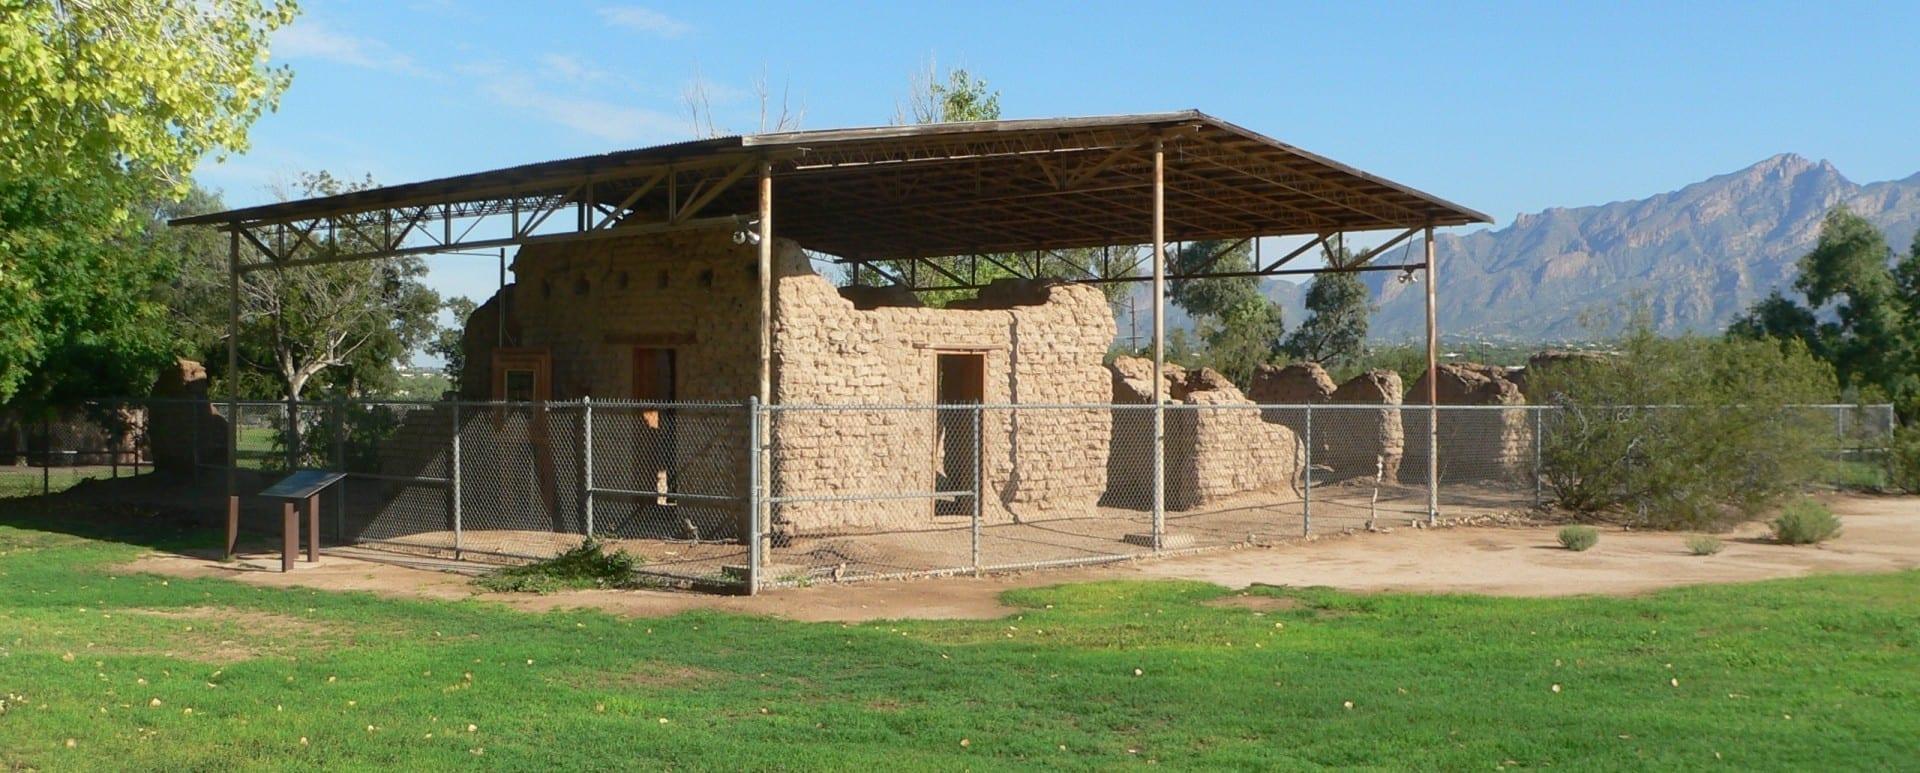 Fort Lowell Tucsón AZ Estados Unidos